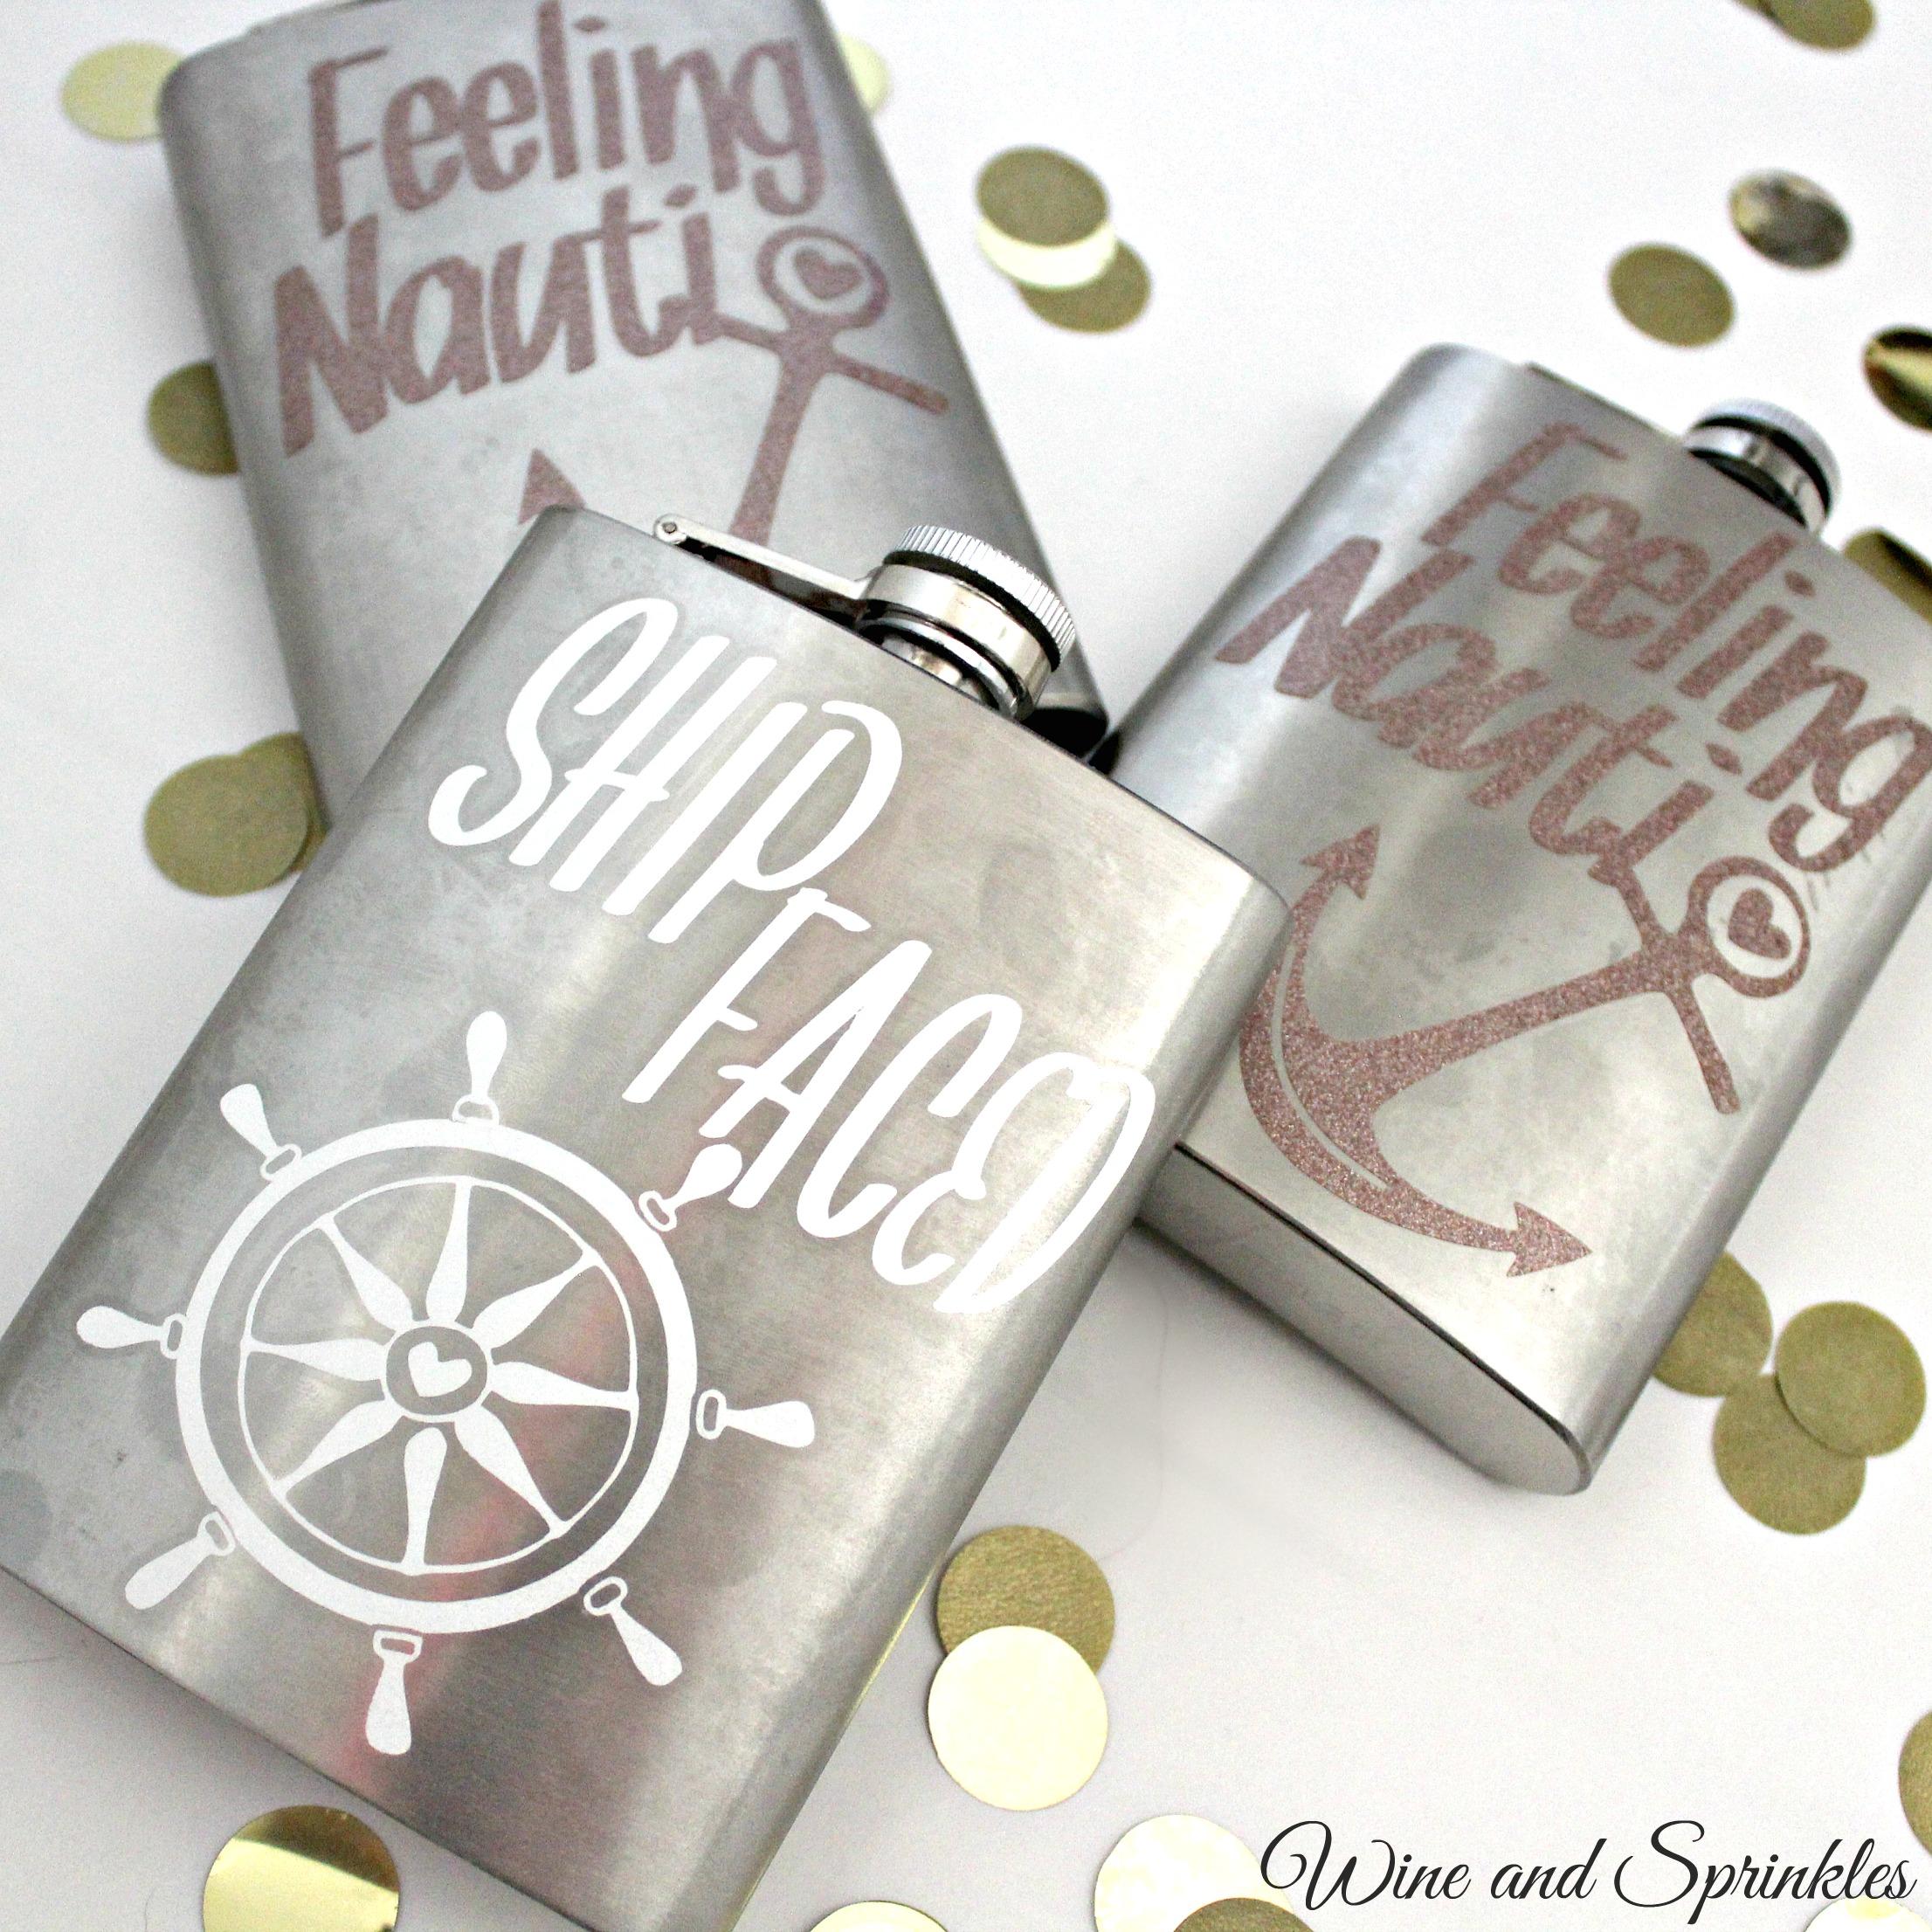 DIY Nautical Bachelorette Party Flasks #bachelorette #cricutprojects #shipfaced #feelingnauti